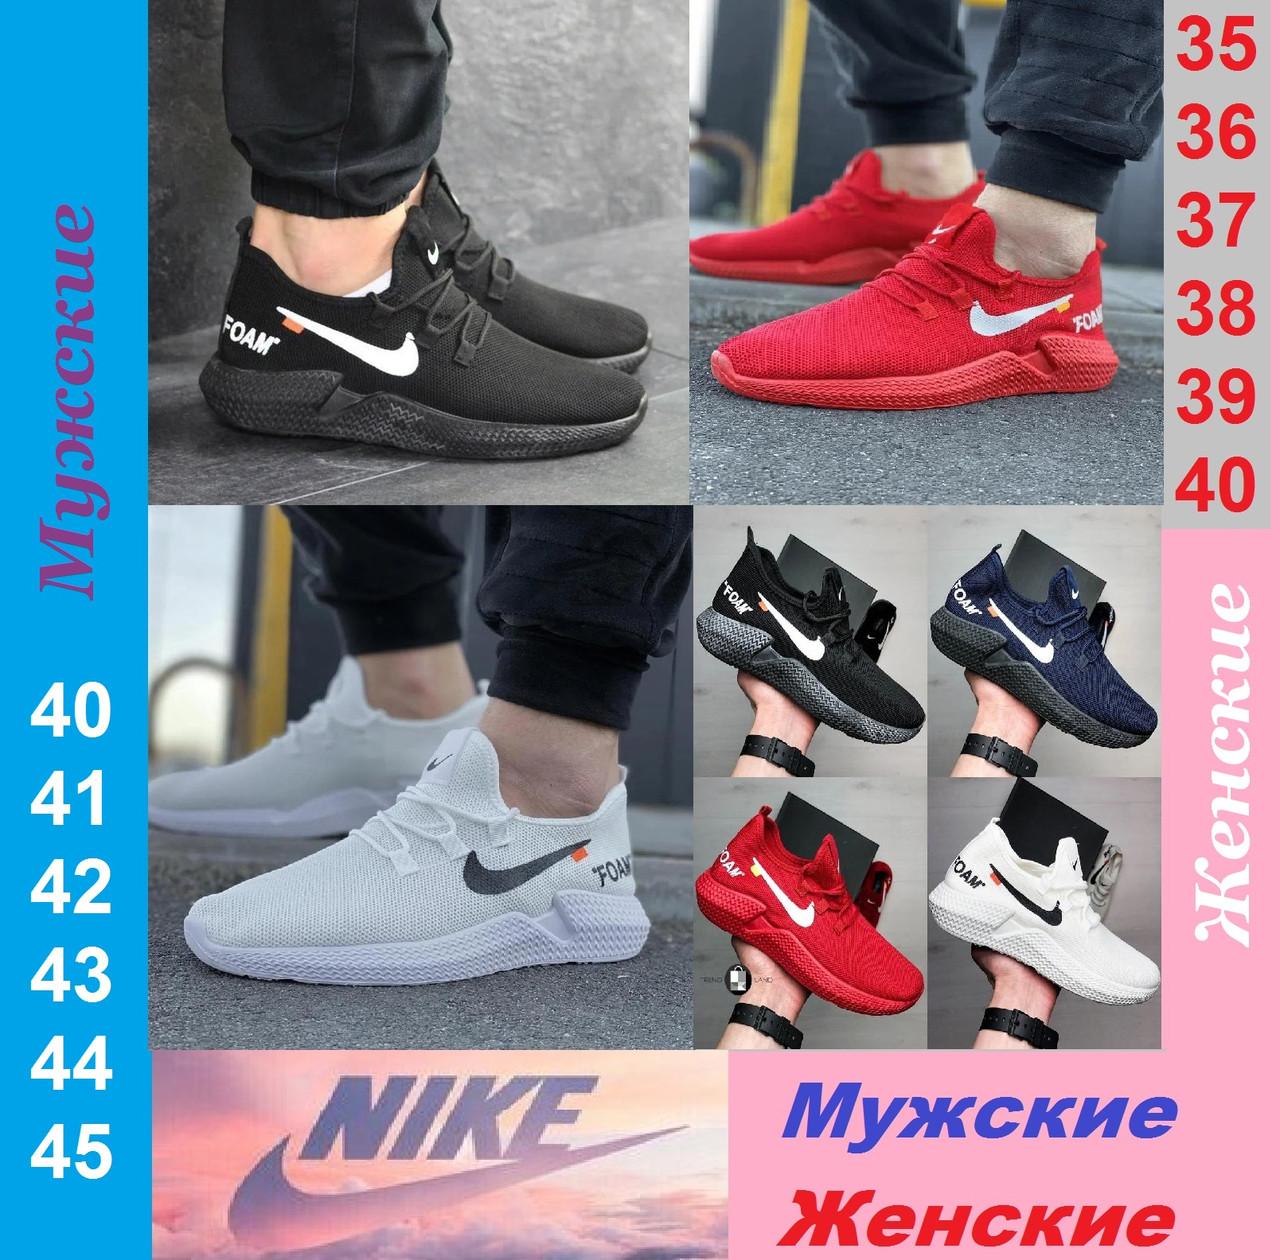 Кроссовки Найк Nike Foam.